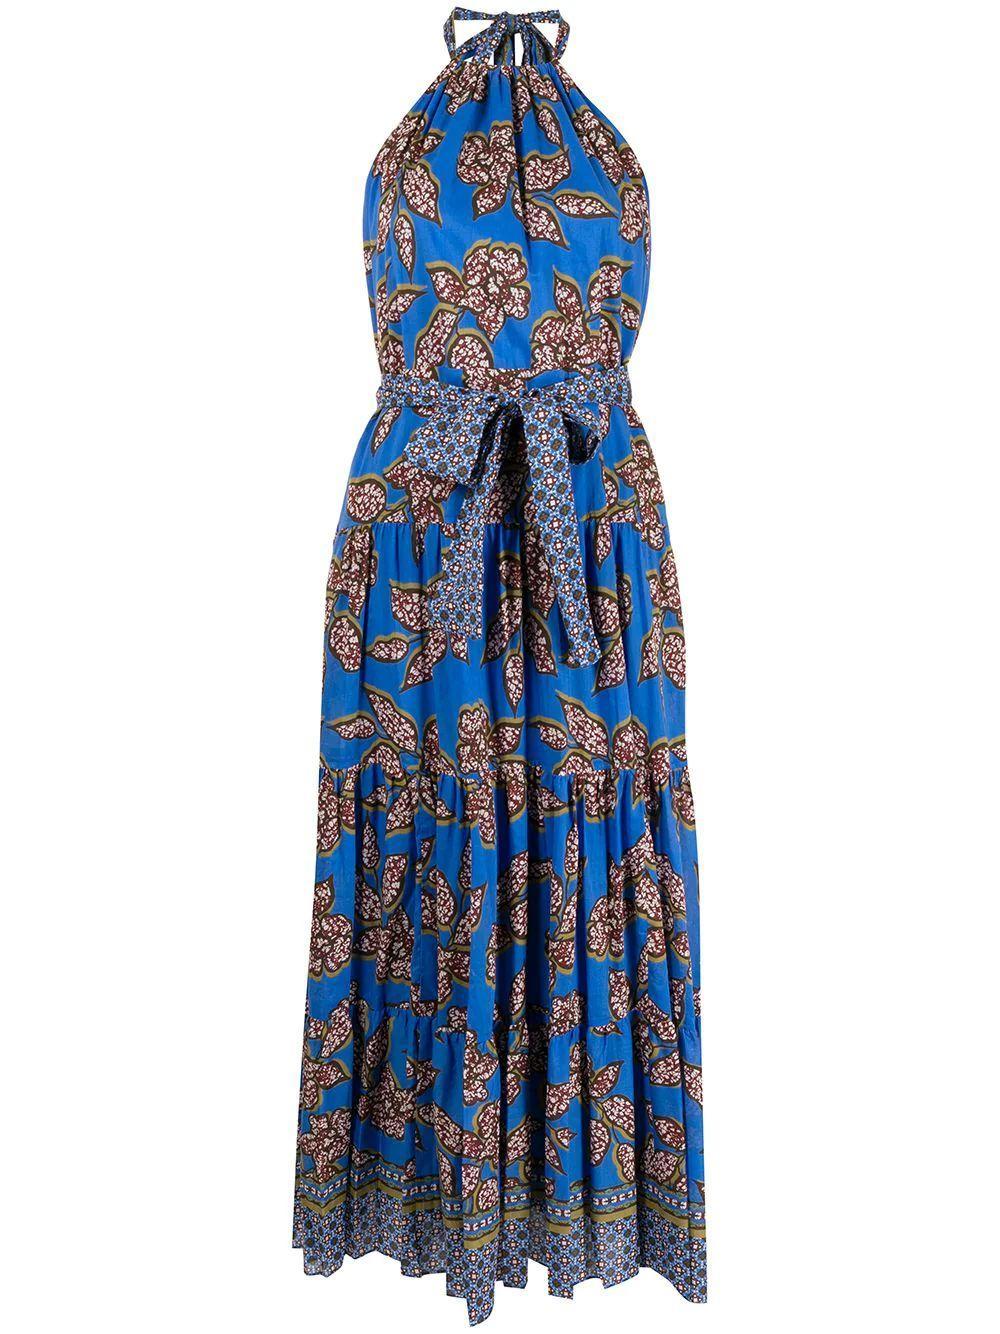 Joyette Printed Maxi Dress